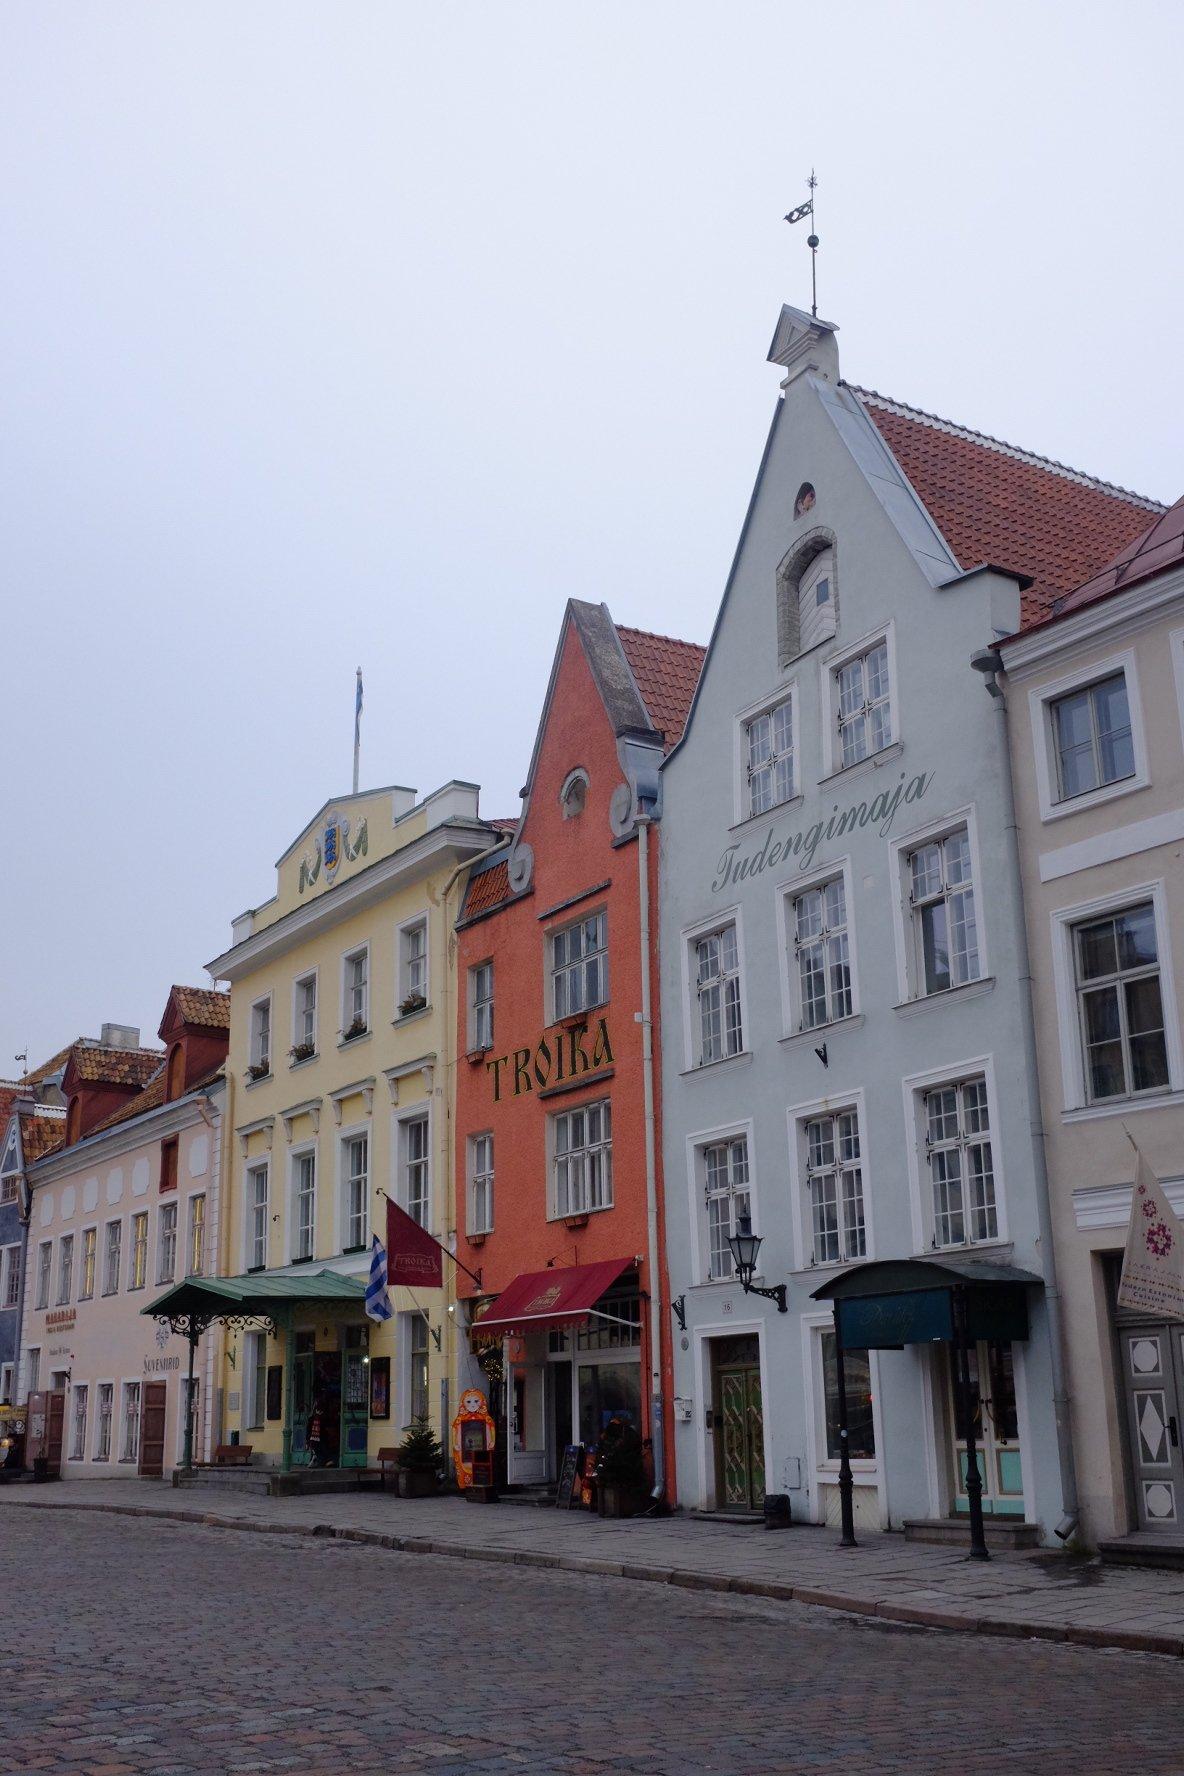 Buildings on Town hall place in Tallinn